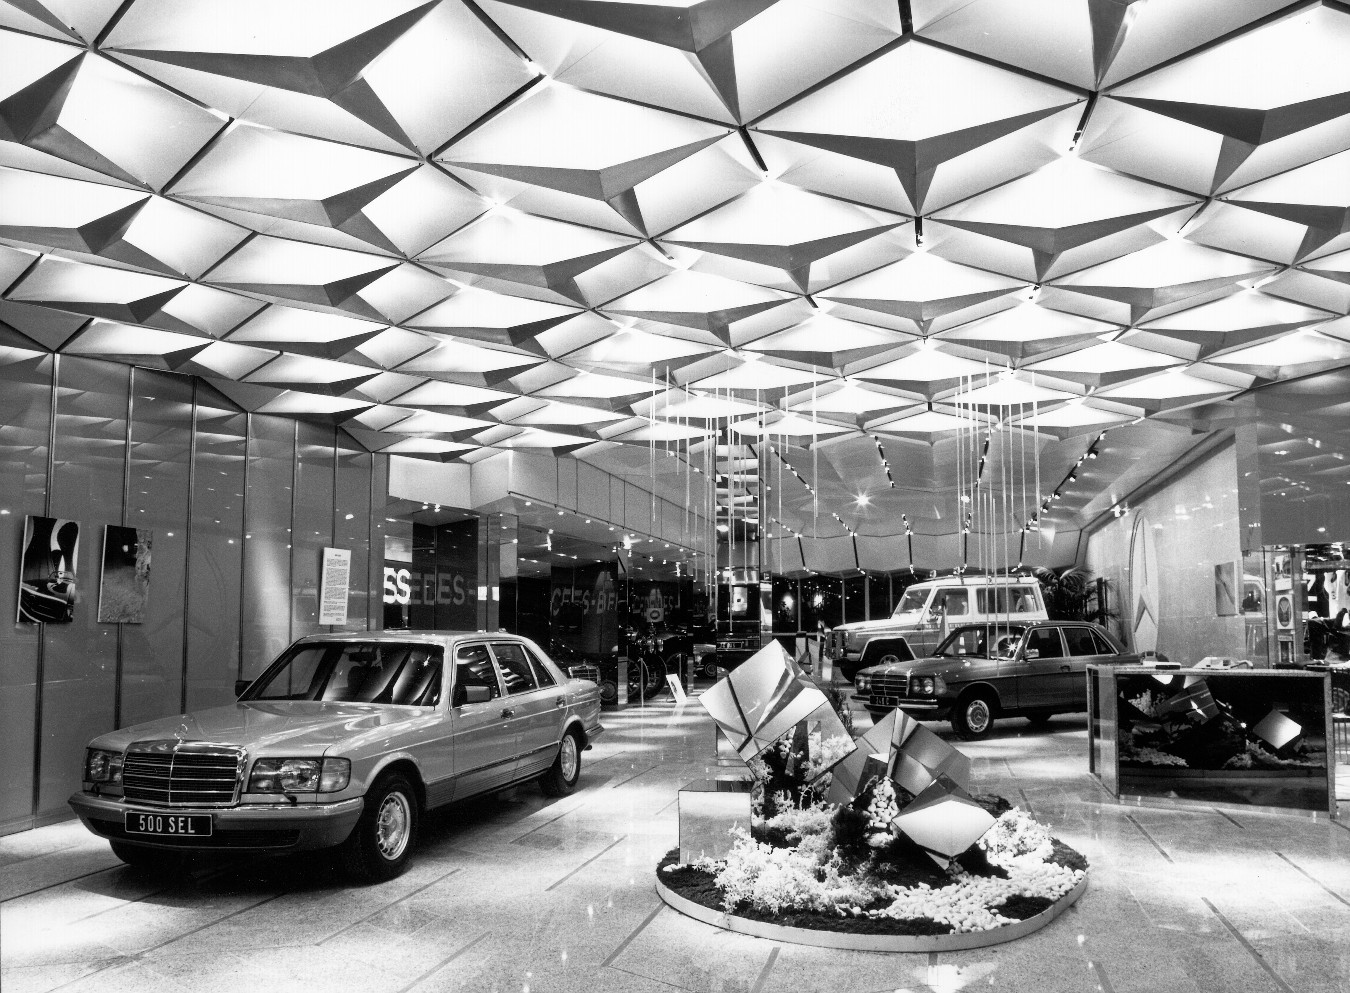 mb exotenforum sonderkarossen umbauten tuning sternenhimmel im 80er jahre mb showroom. Black Bedroom Furniture Sets. Home Design Ideas